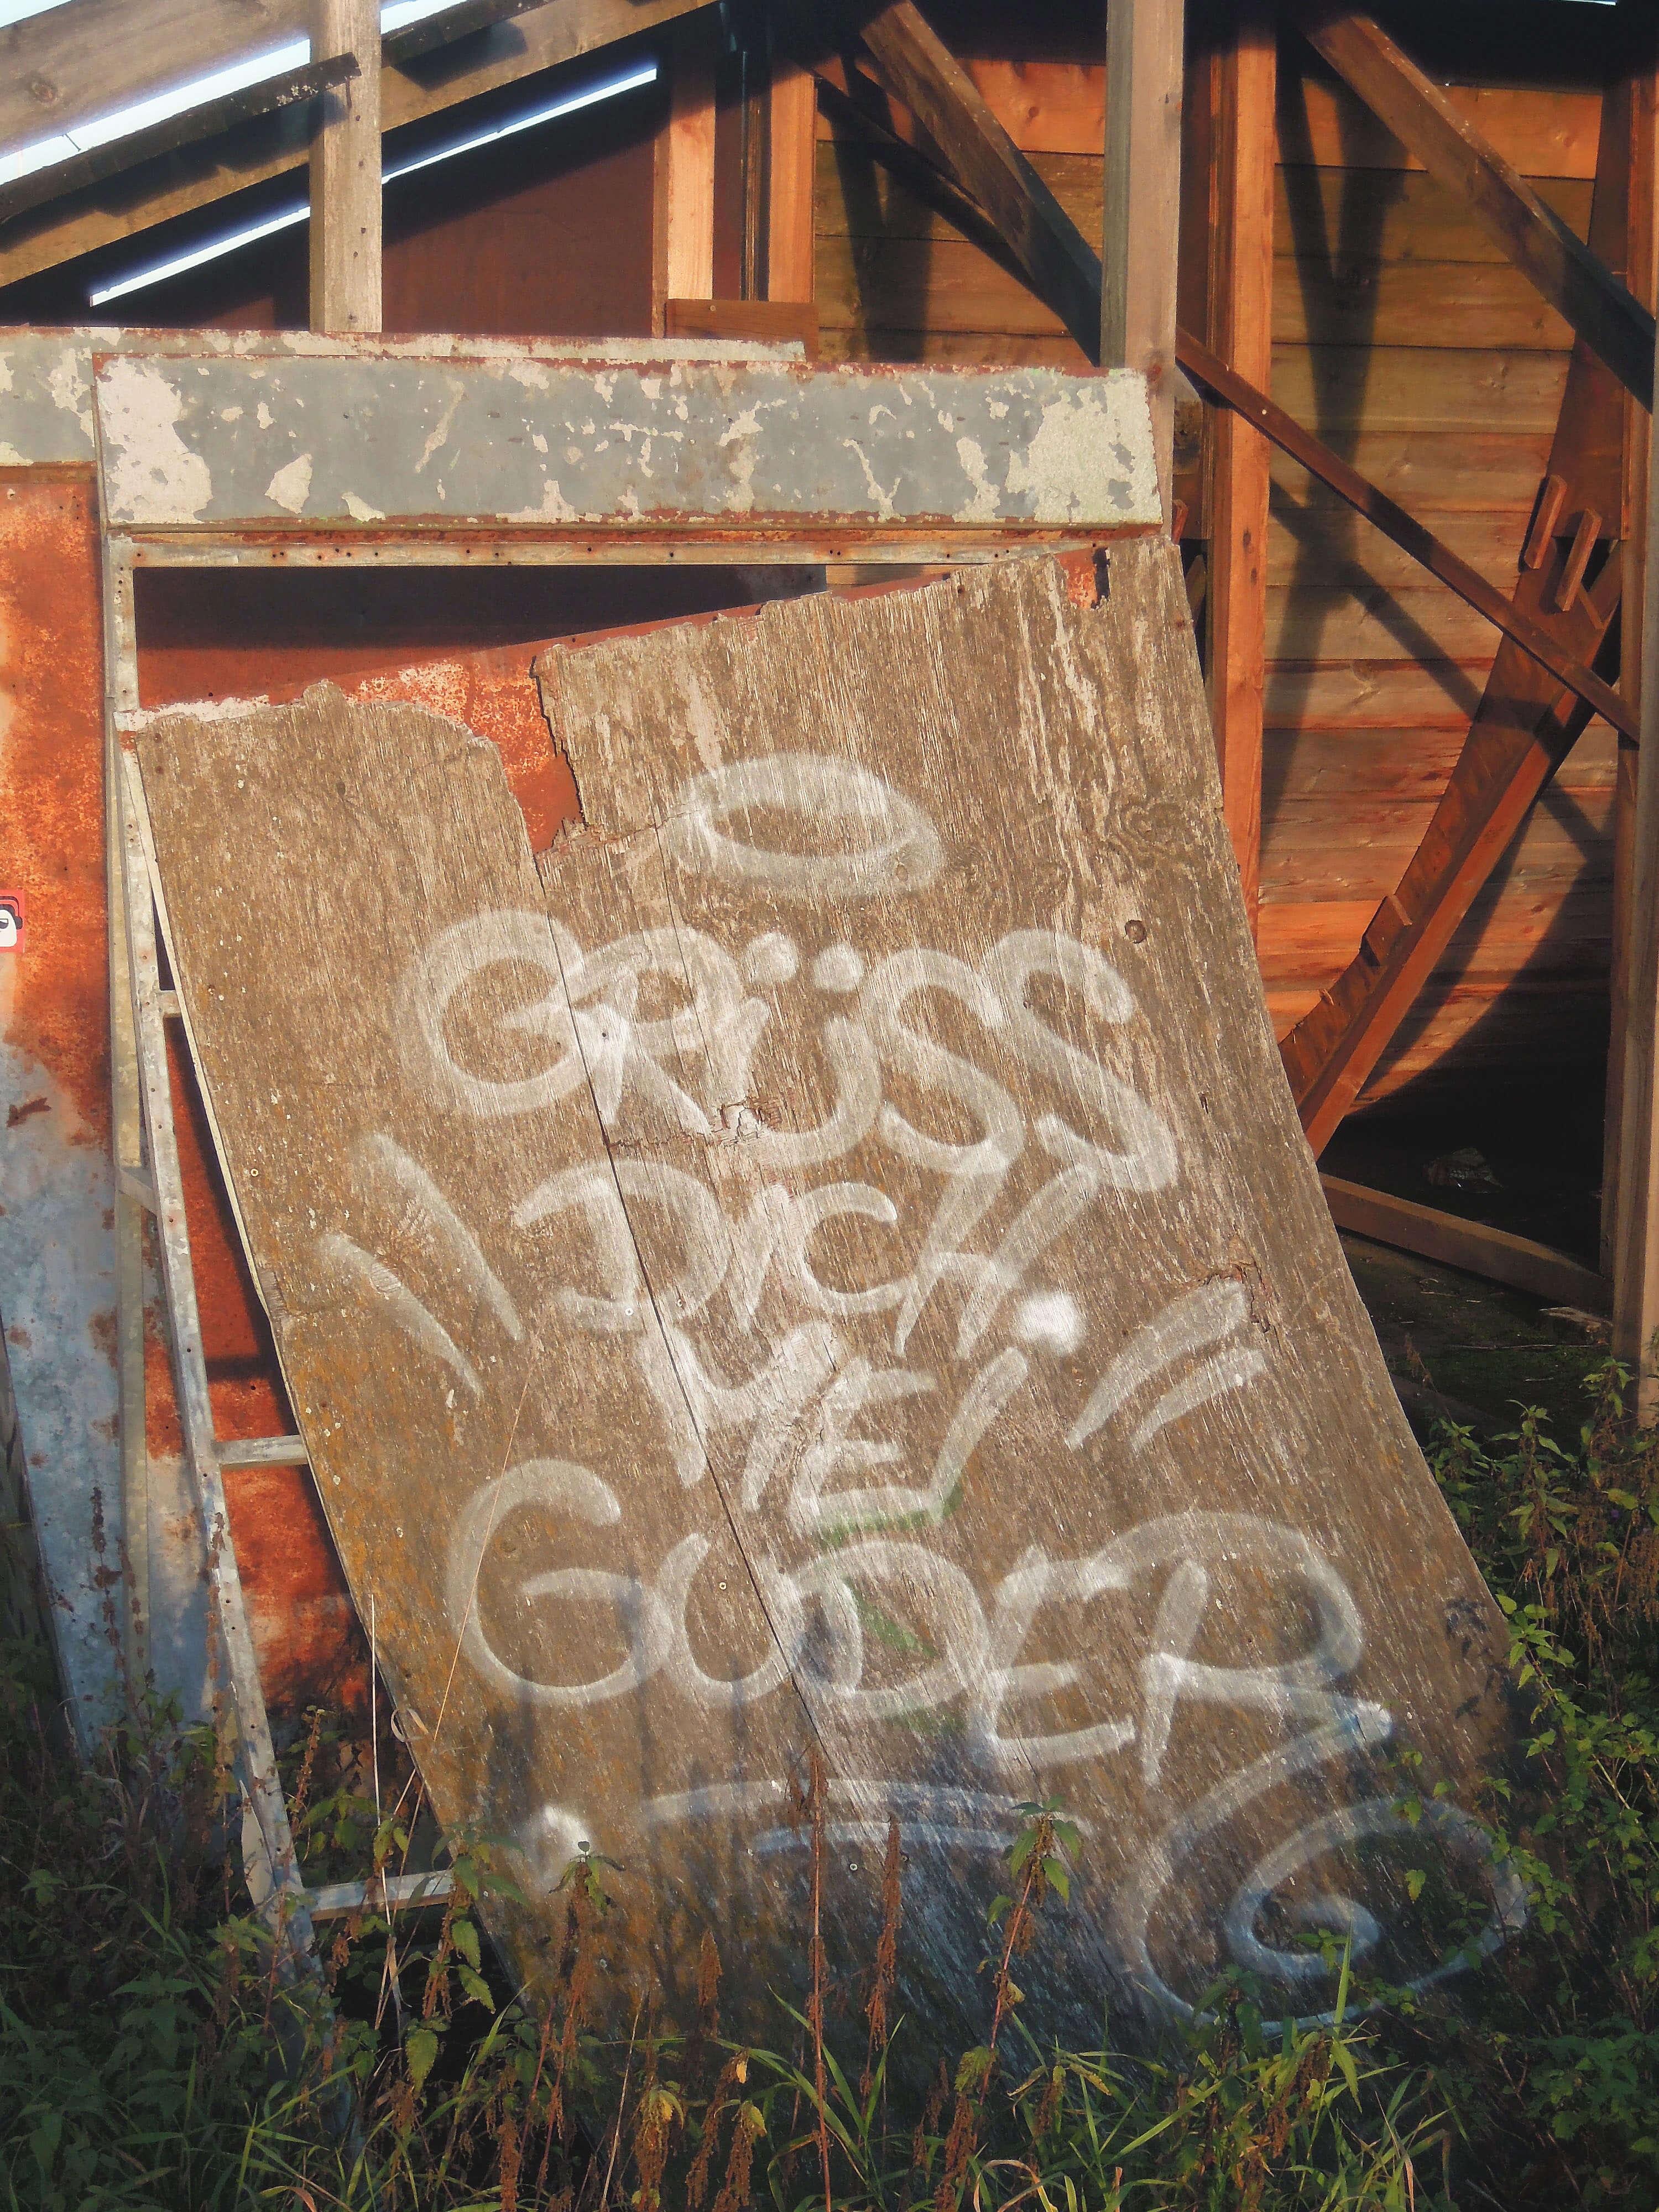 GDMG Miniramp. Kunst und so - Grüß dich mei Guder. Street Art. Graffiti Coburg. JDE TDN CSW GDMG!